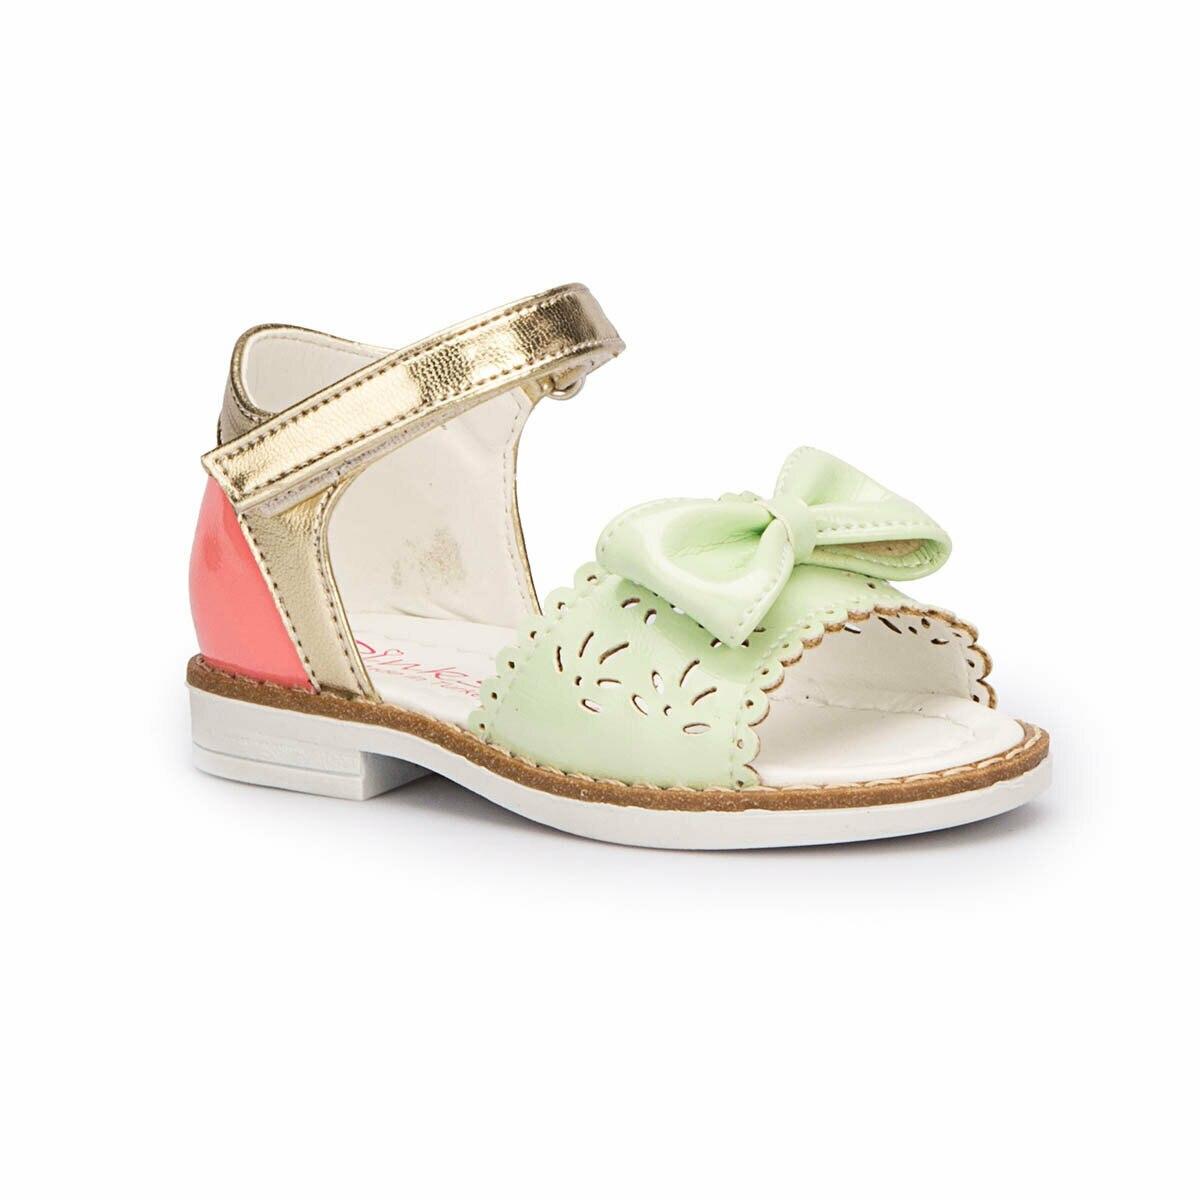 FLO RIRI Mint Female Child Sandals PINKSTEP